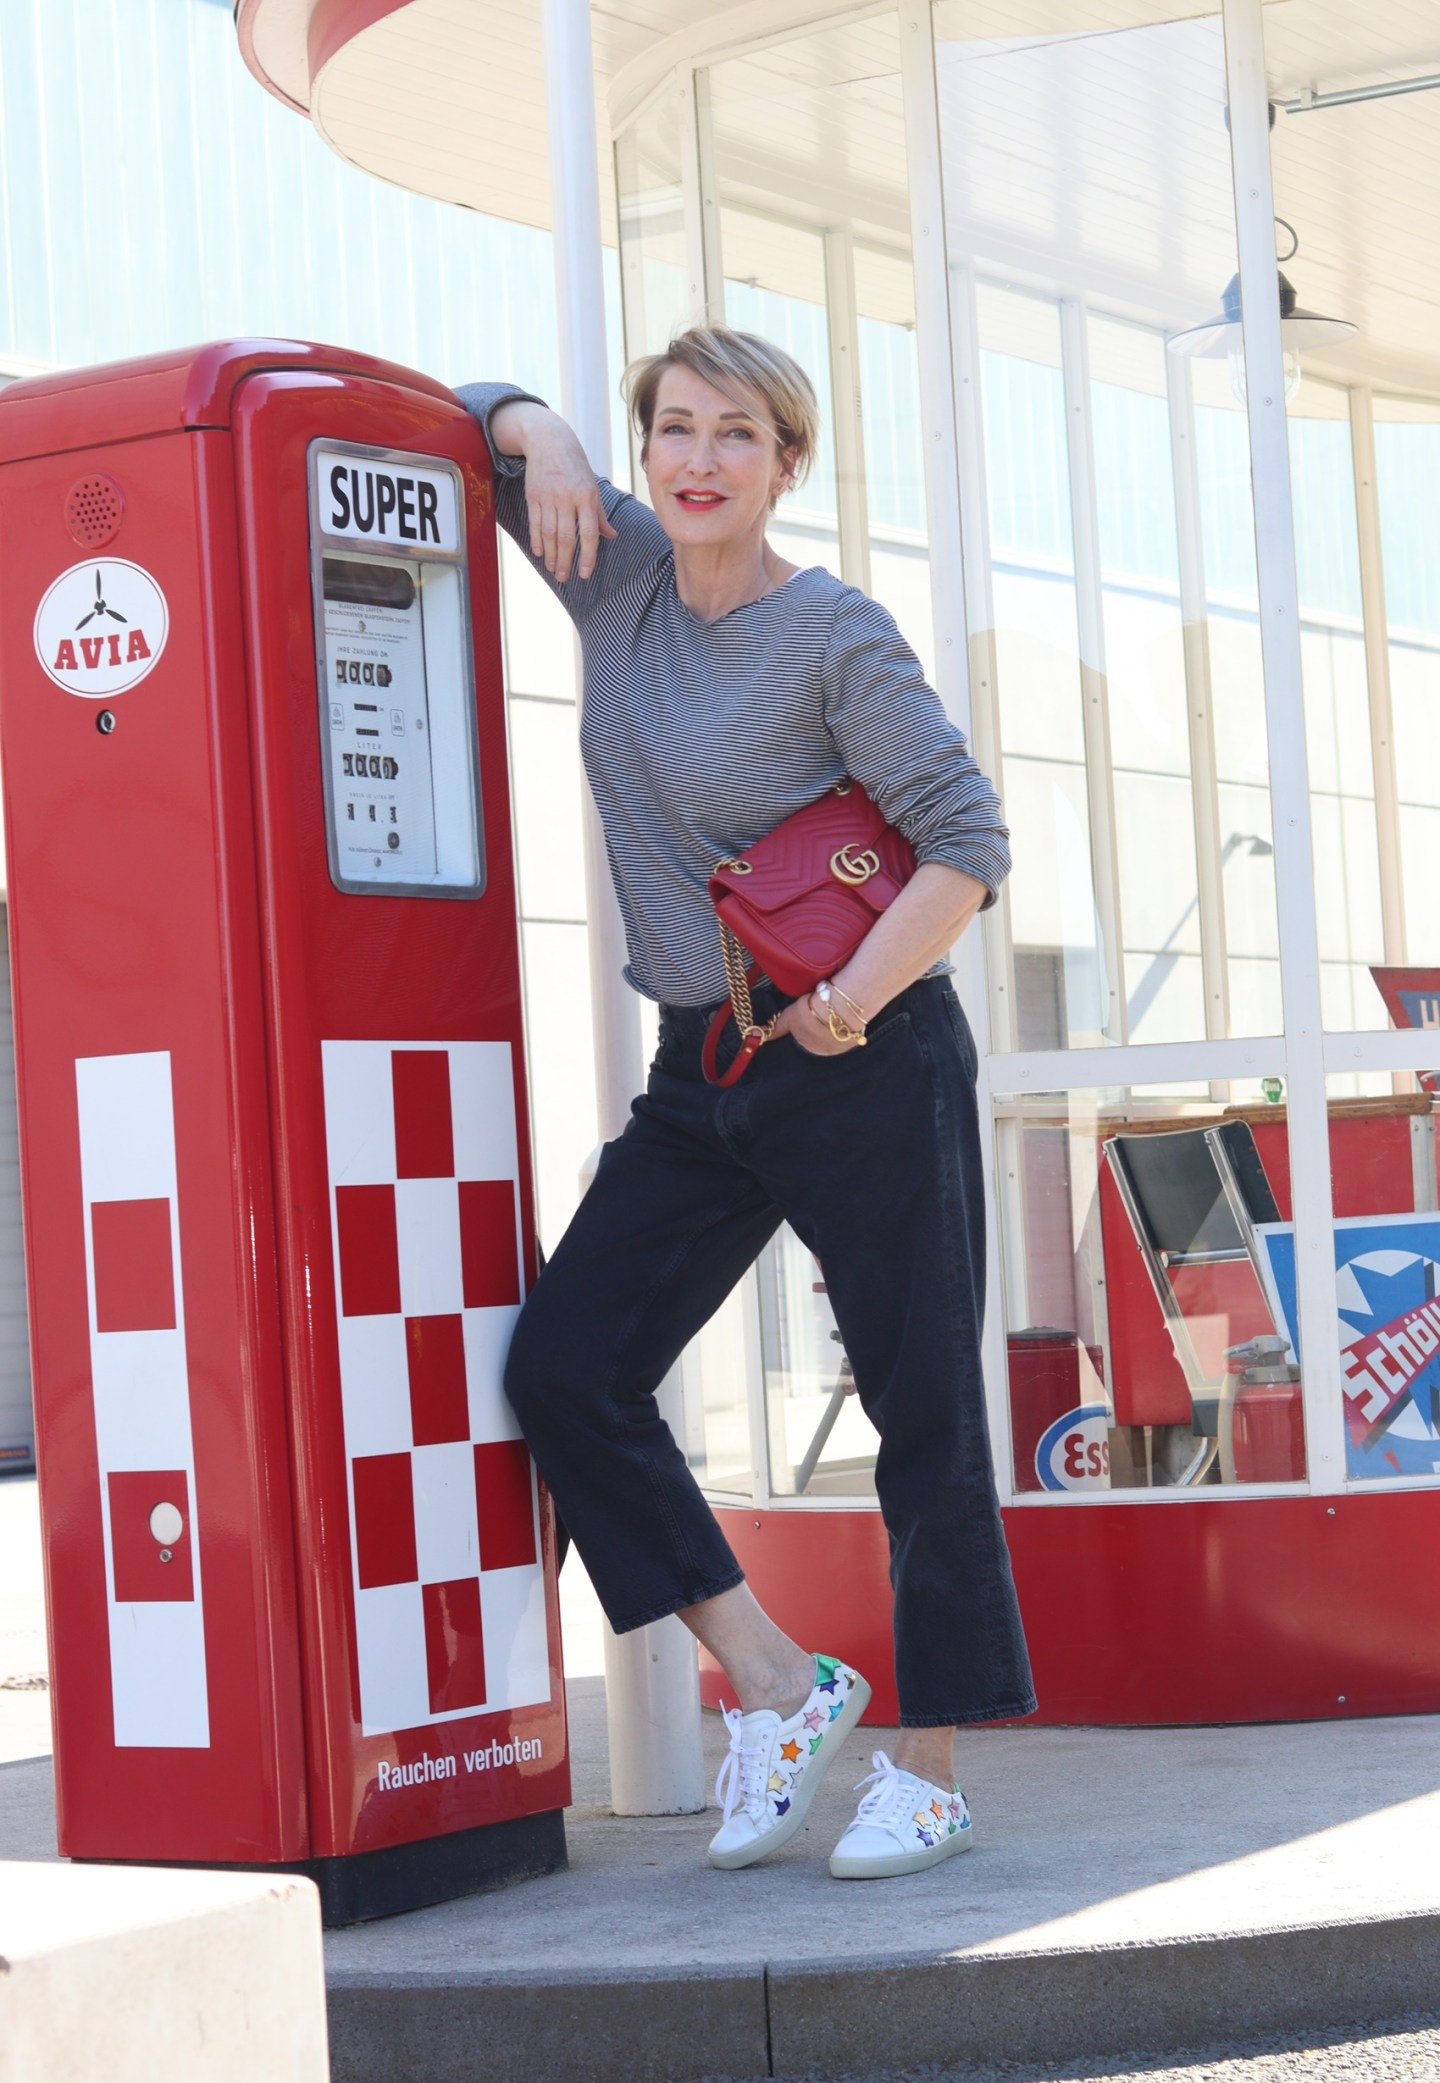 glamupyourlifestyle Ringel-Outfit gestreiftes-Shirt ue-40-mode ue-50-blog